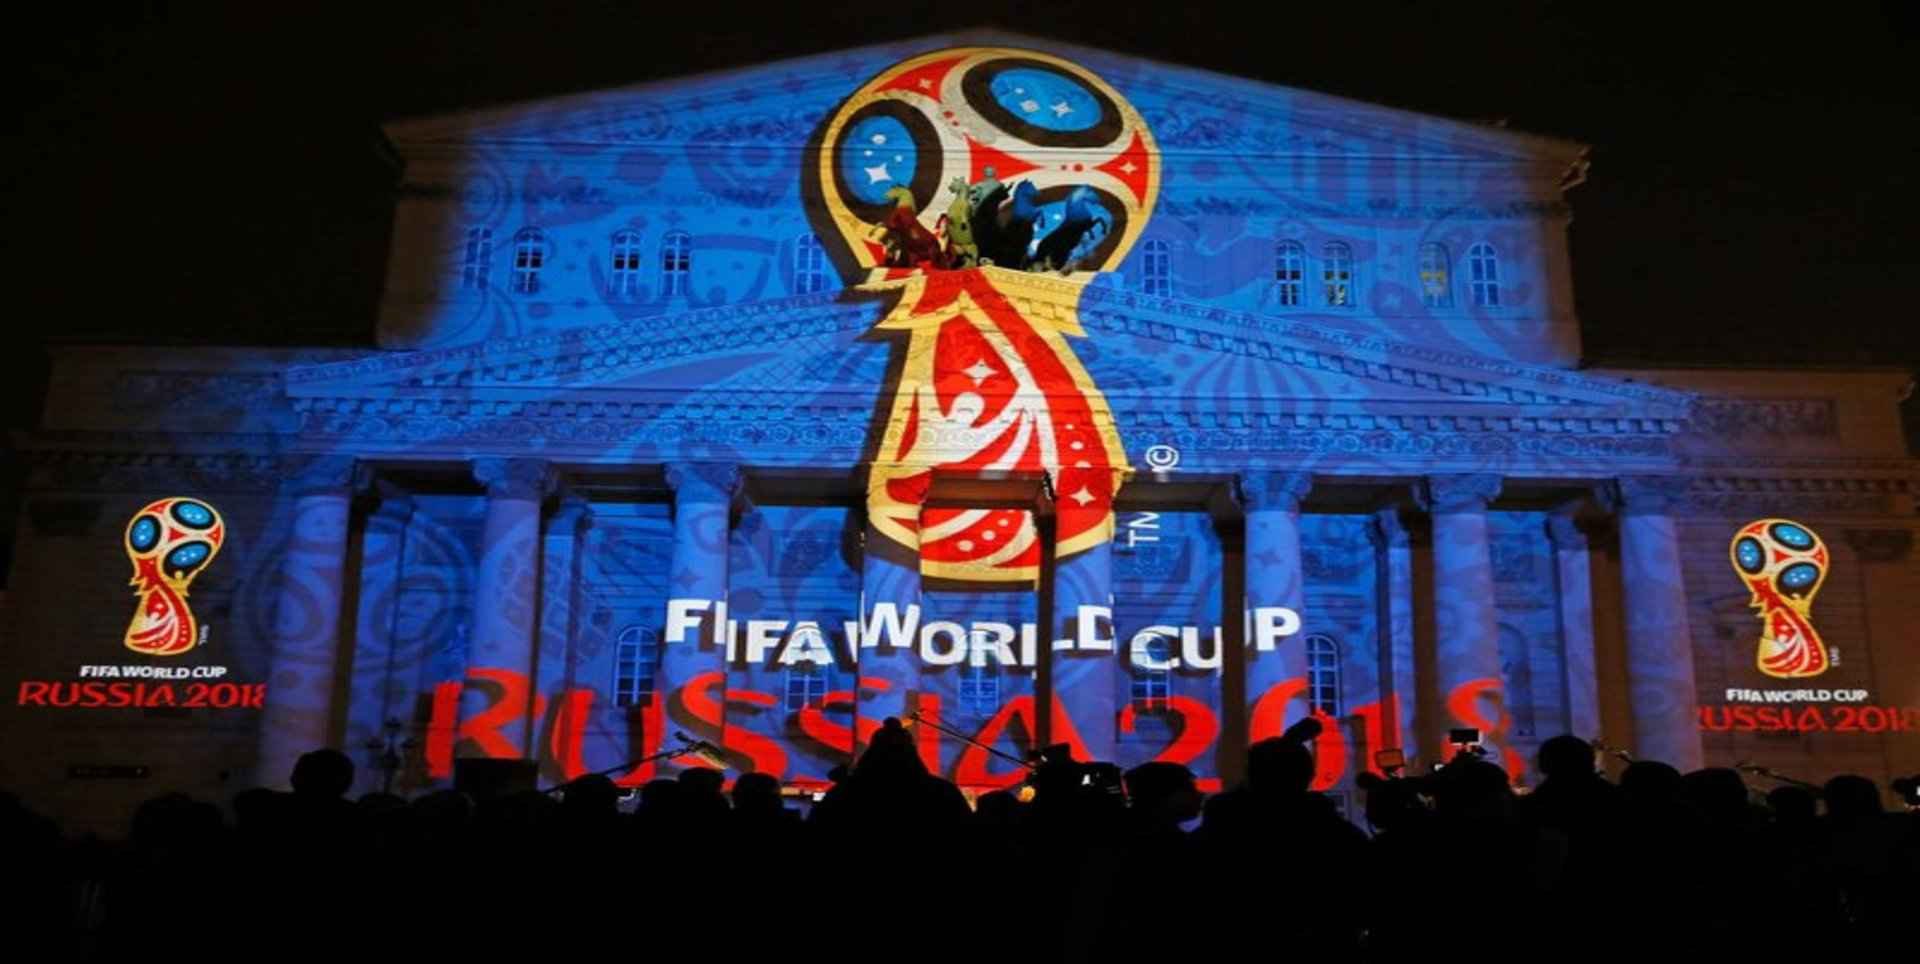 FIFA WC United States V Costa Rica Live